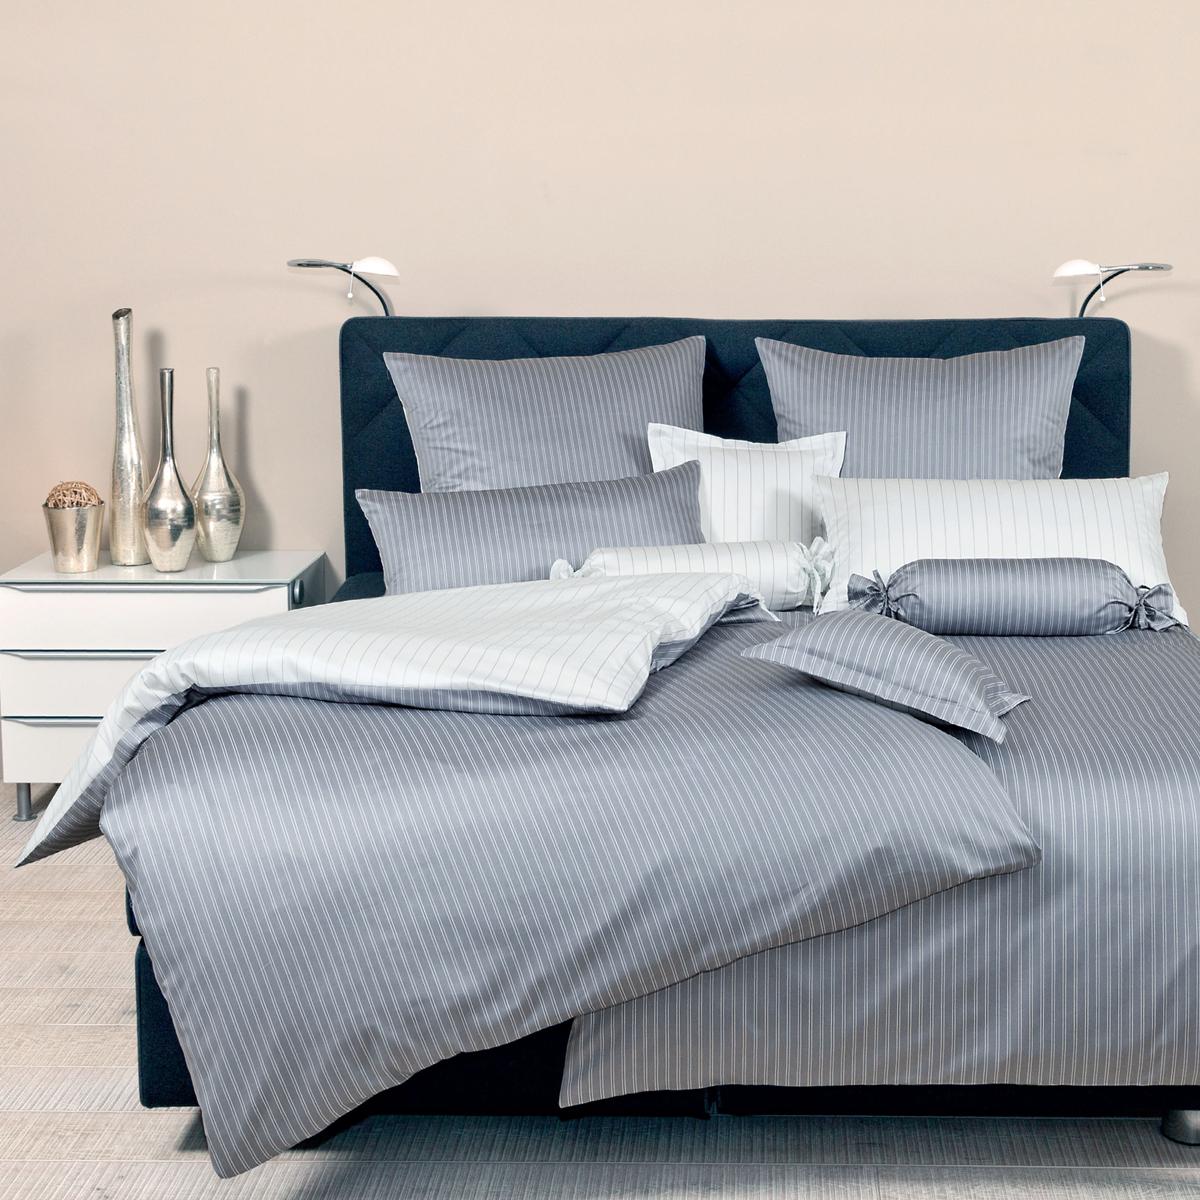 mako seidensatin modern classic 3936 janine kissenbezug bettw sche gastro inn. Black Bedroom Furniture Sets. Home Design Ideas